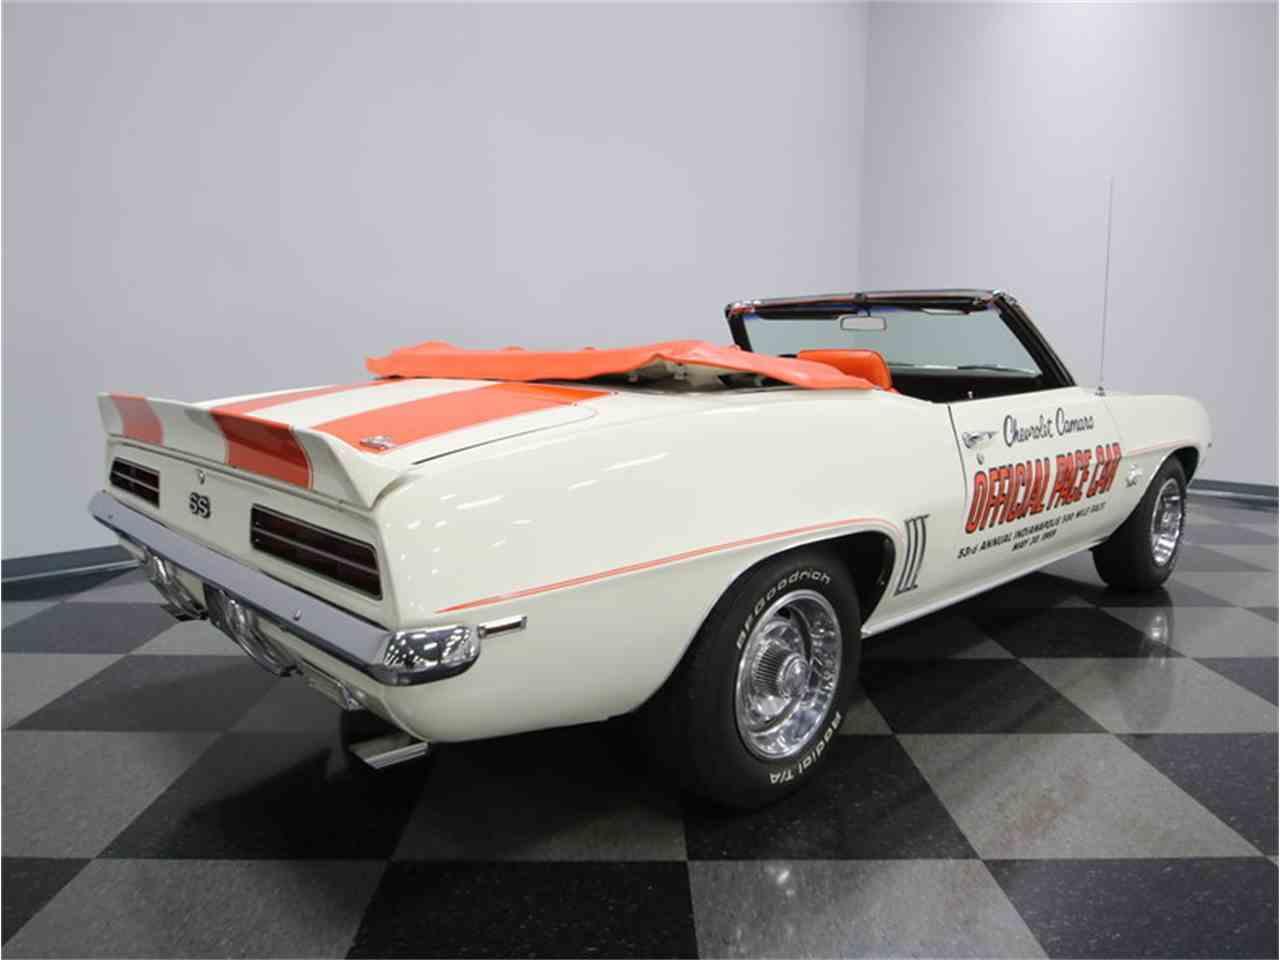 1969 Chevrolet Camaro Rs Ss Pace Car For Sale Classiccars Com Cc 930579